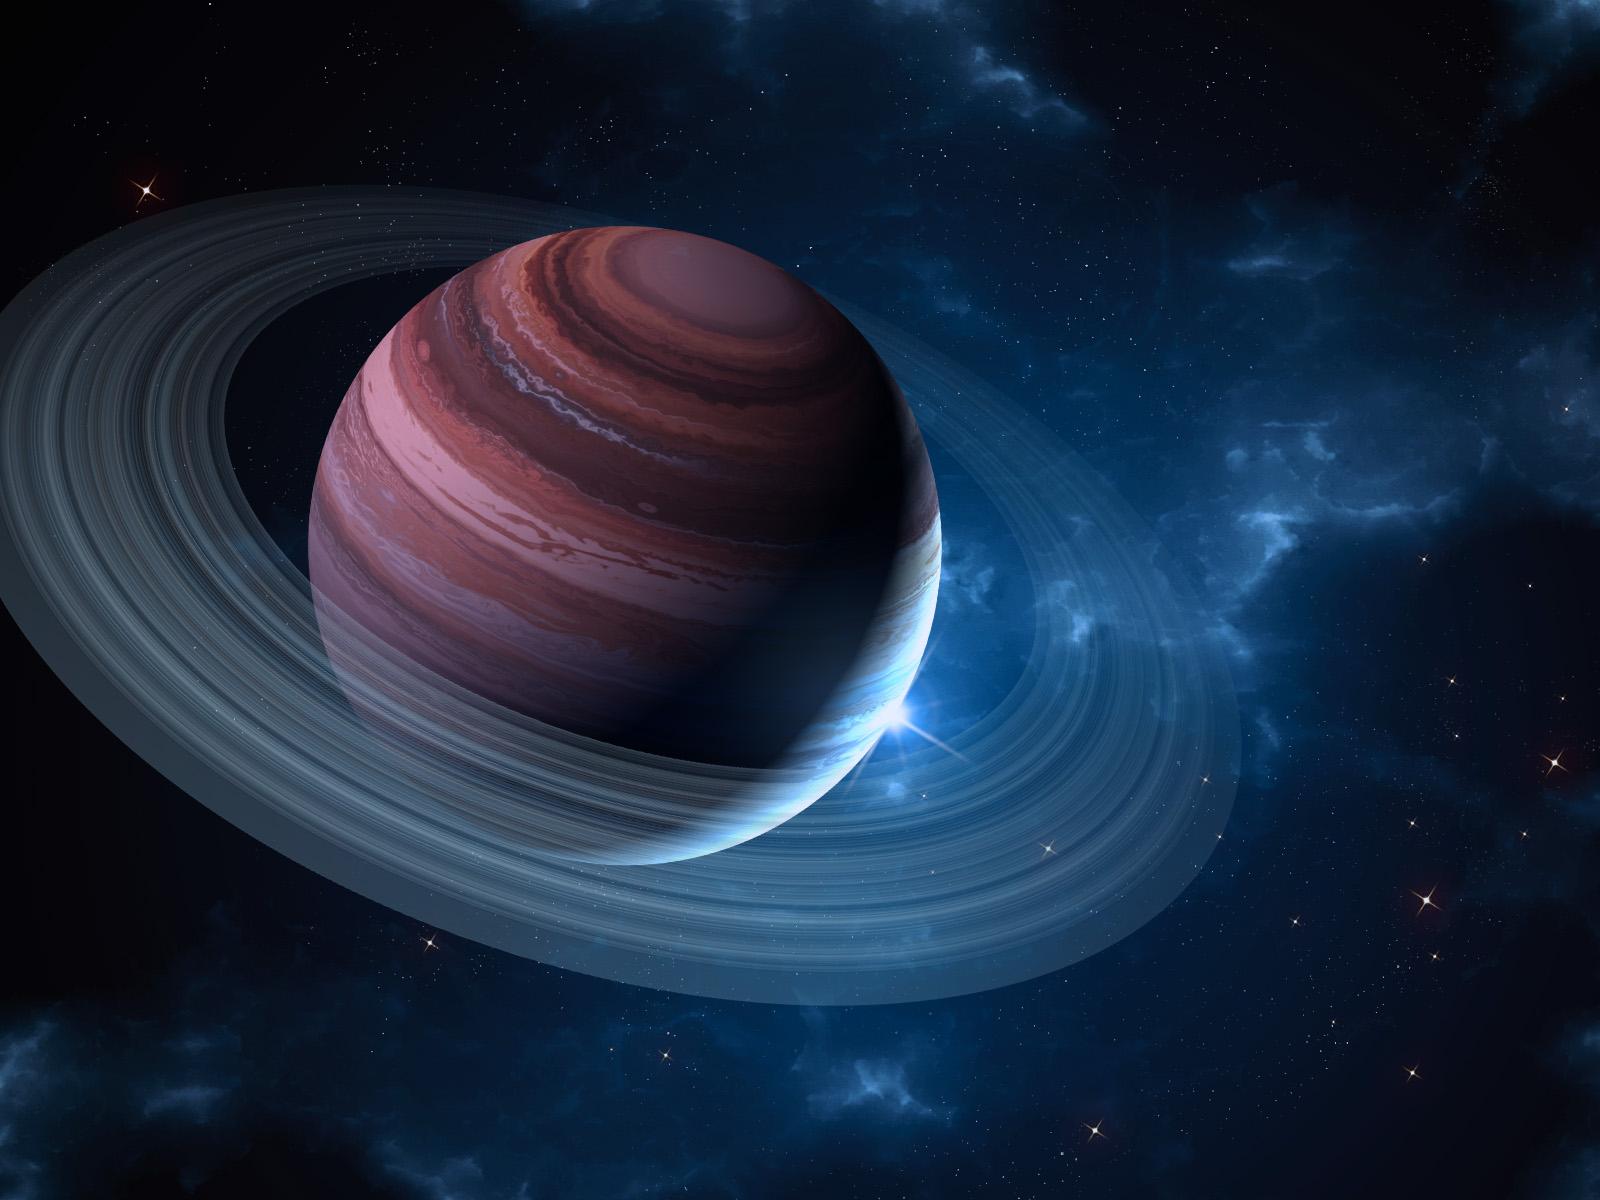 blue giant planet - photo #21